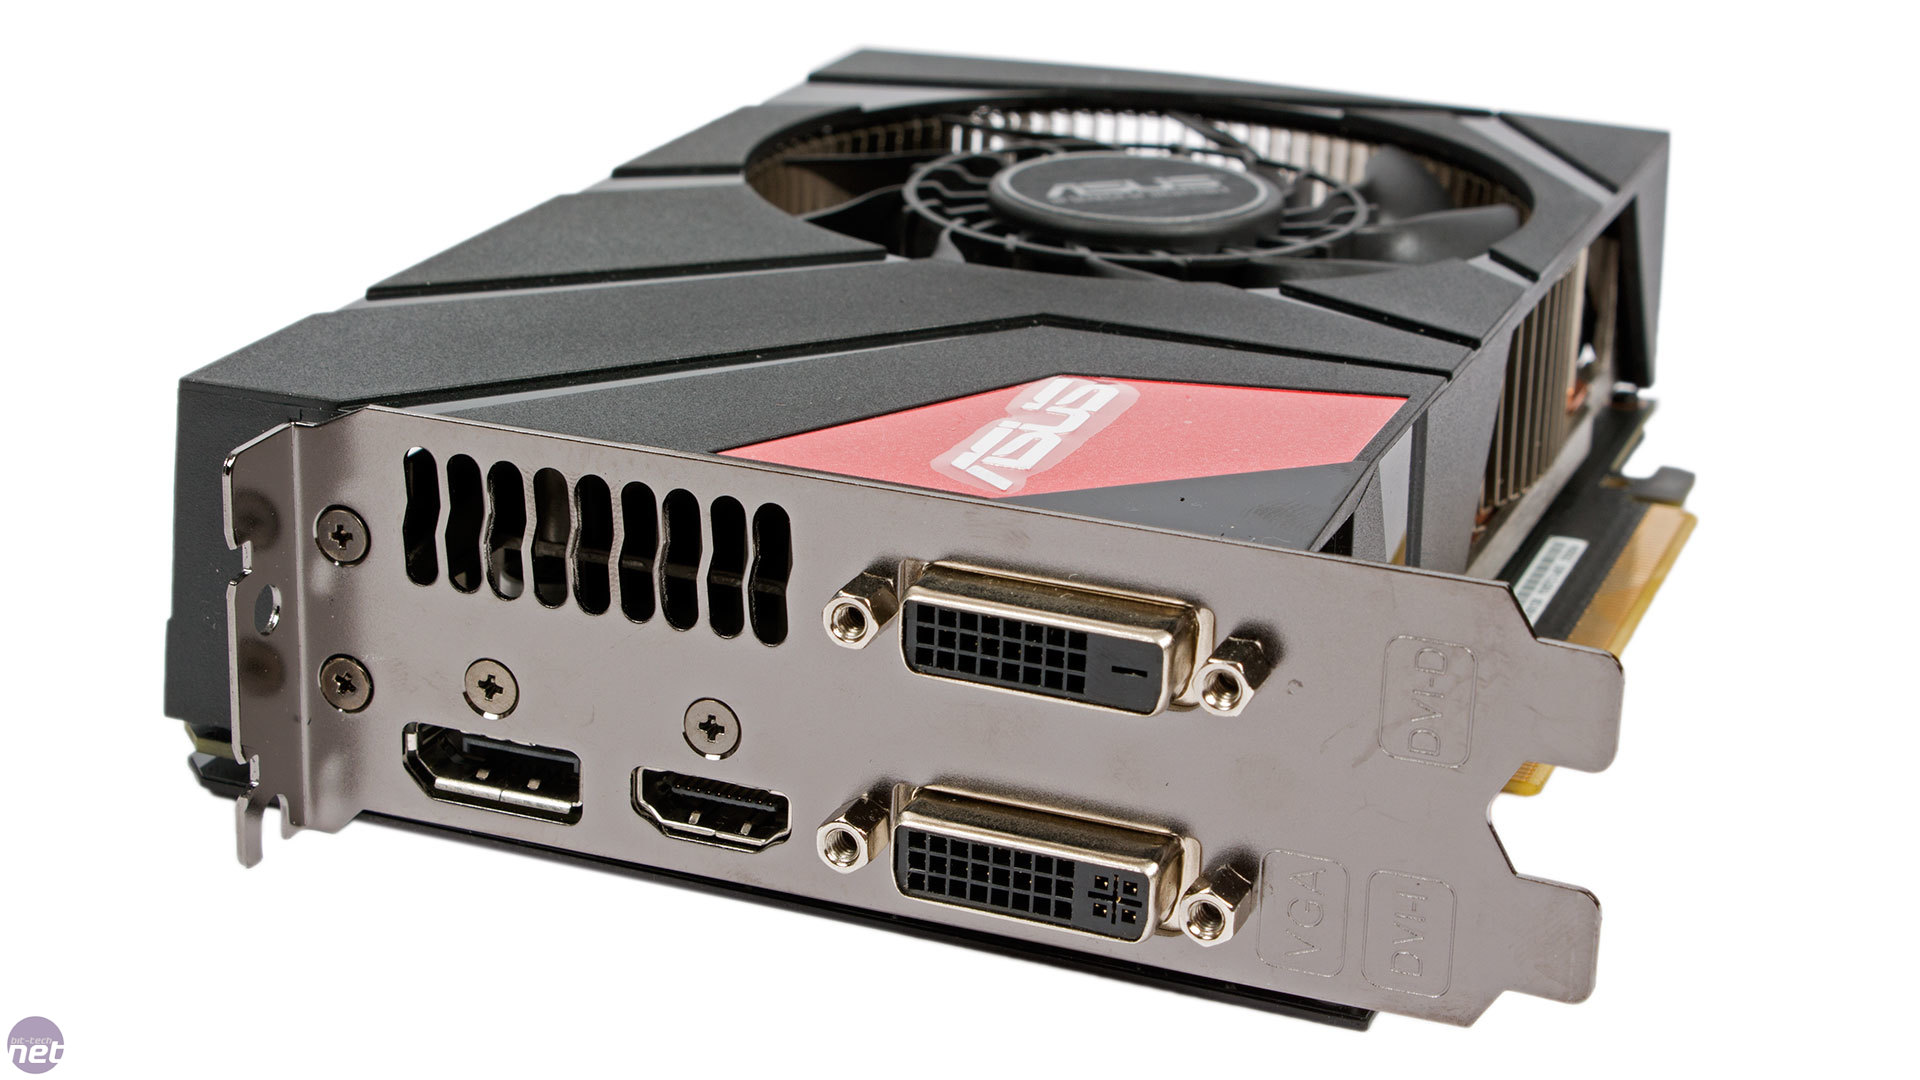 Asus GeForce GTX 970 DirectCU Mini Review | bit-tech net